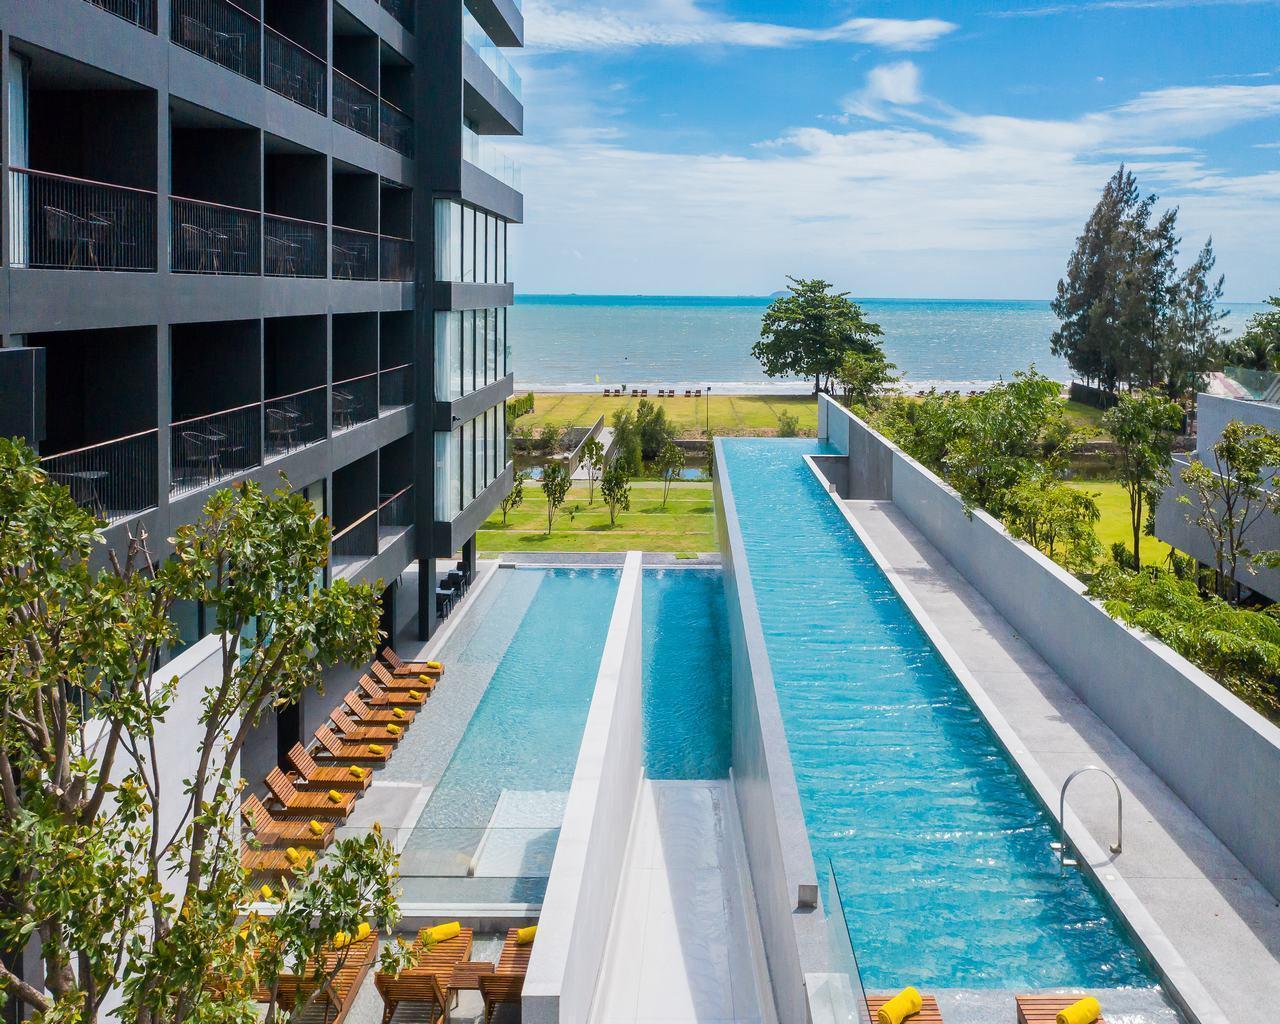 Ana Anan Resort & Villas Pattaya อาณา อานันท์ รีสอร์ต แอนด์ วิลล่า พัทยา